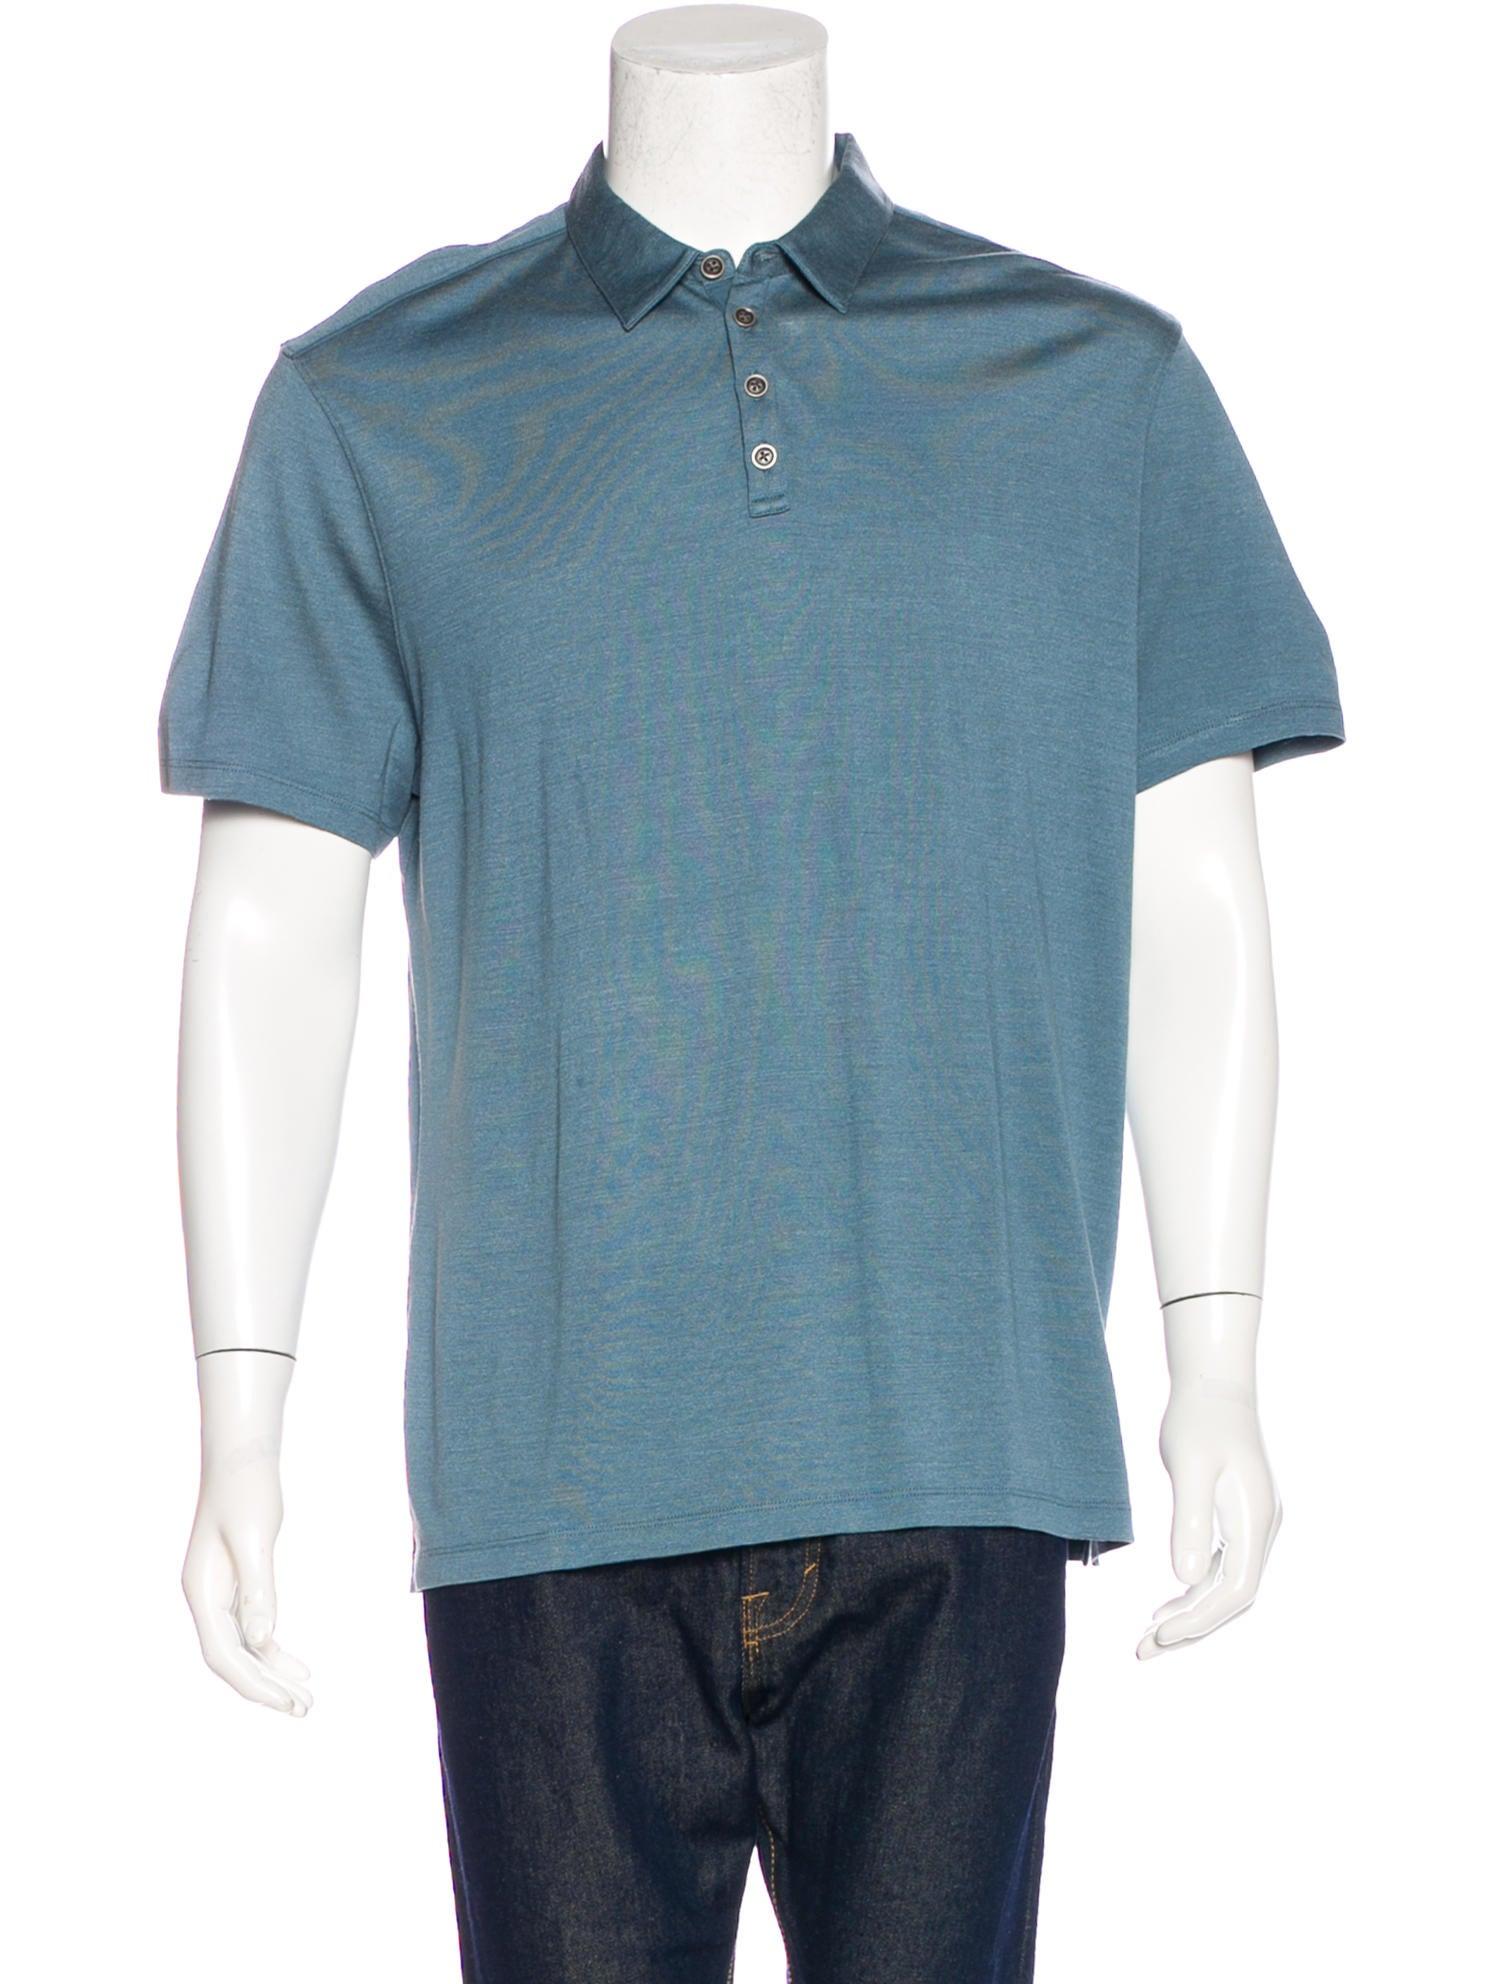 John Varvatos Silk Blend Polo Shirt Clothing Jva24126